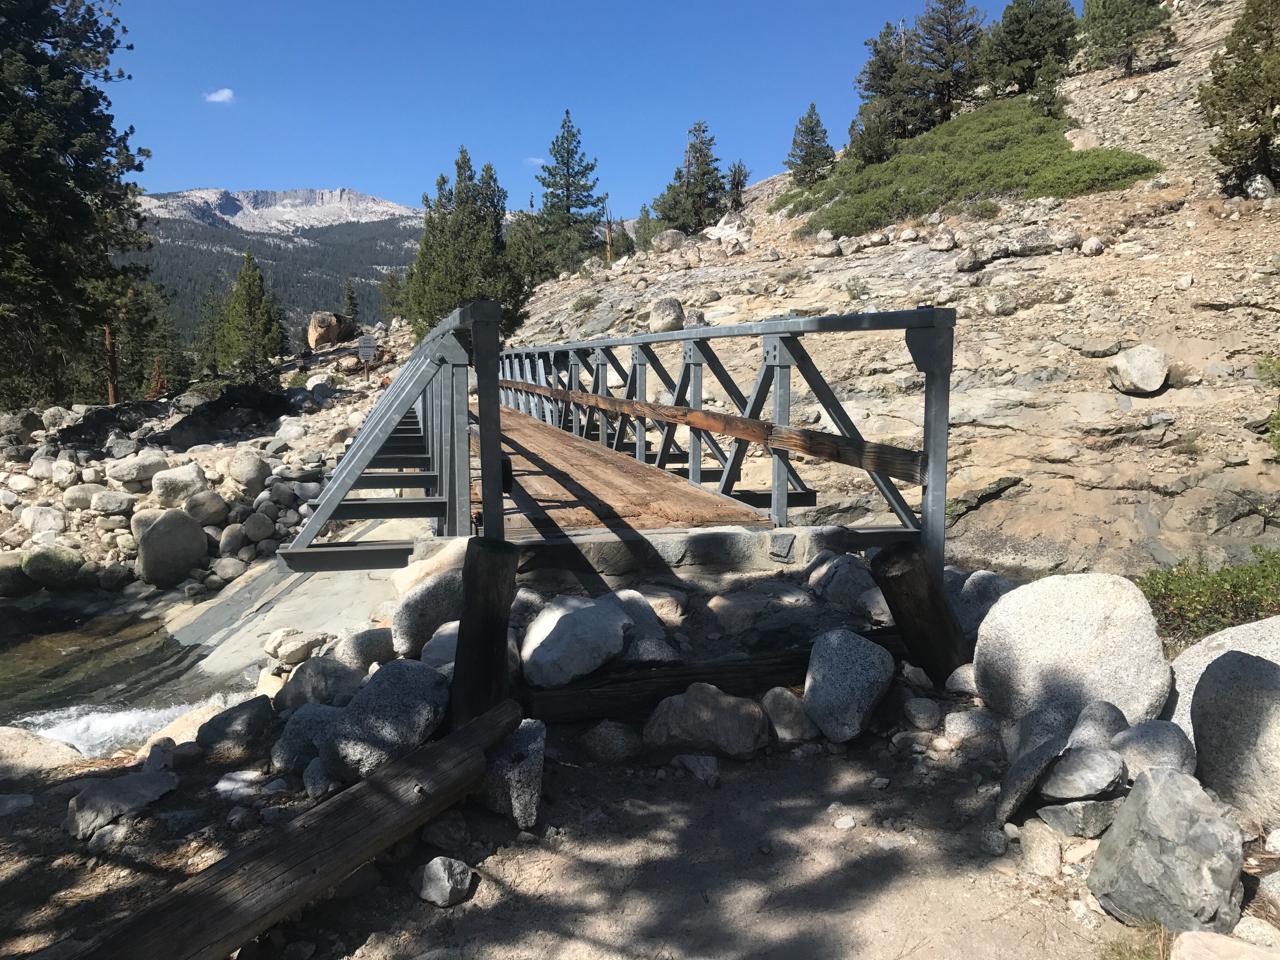 Piute Creek Bridge